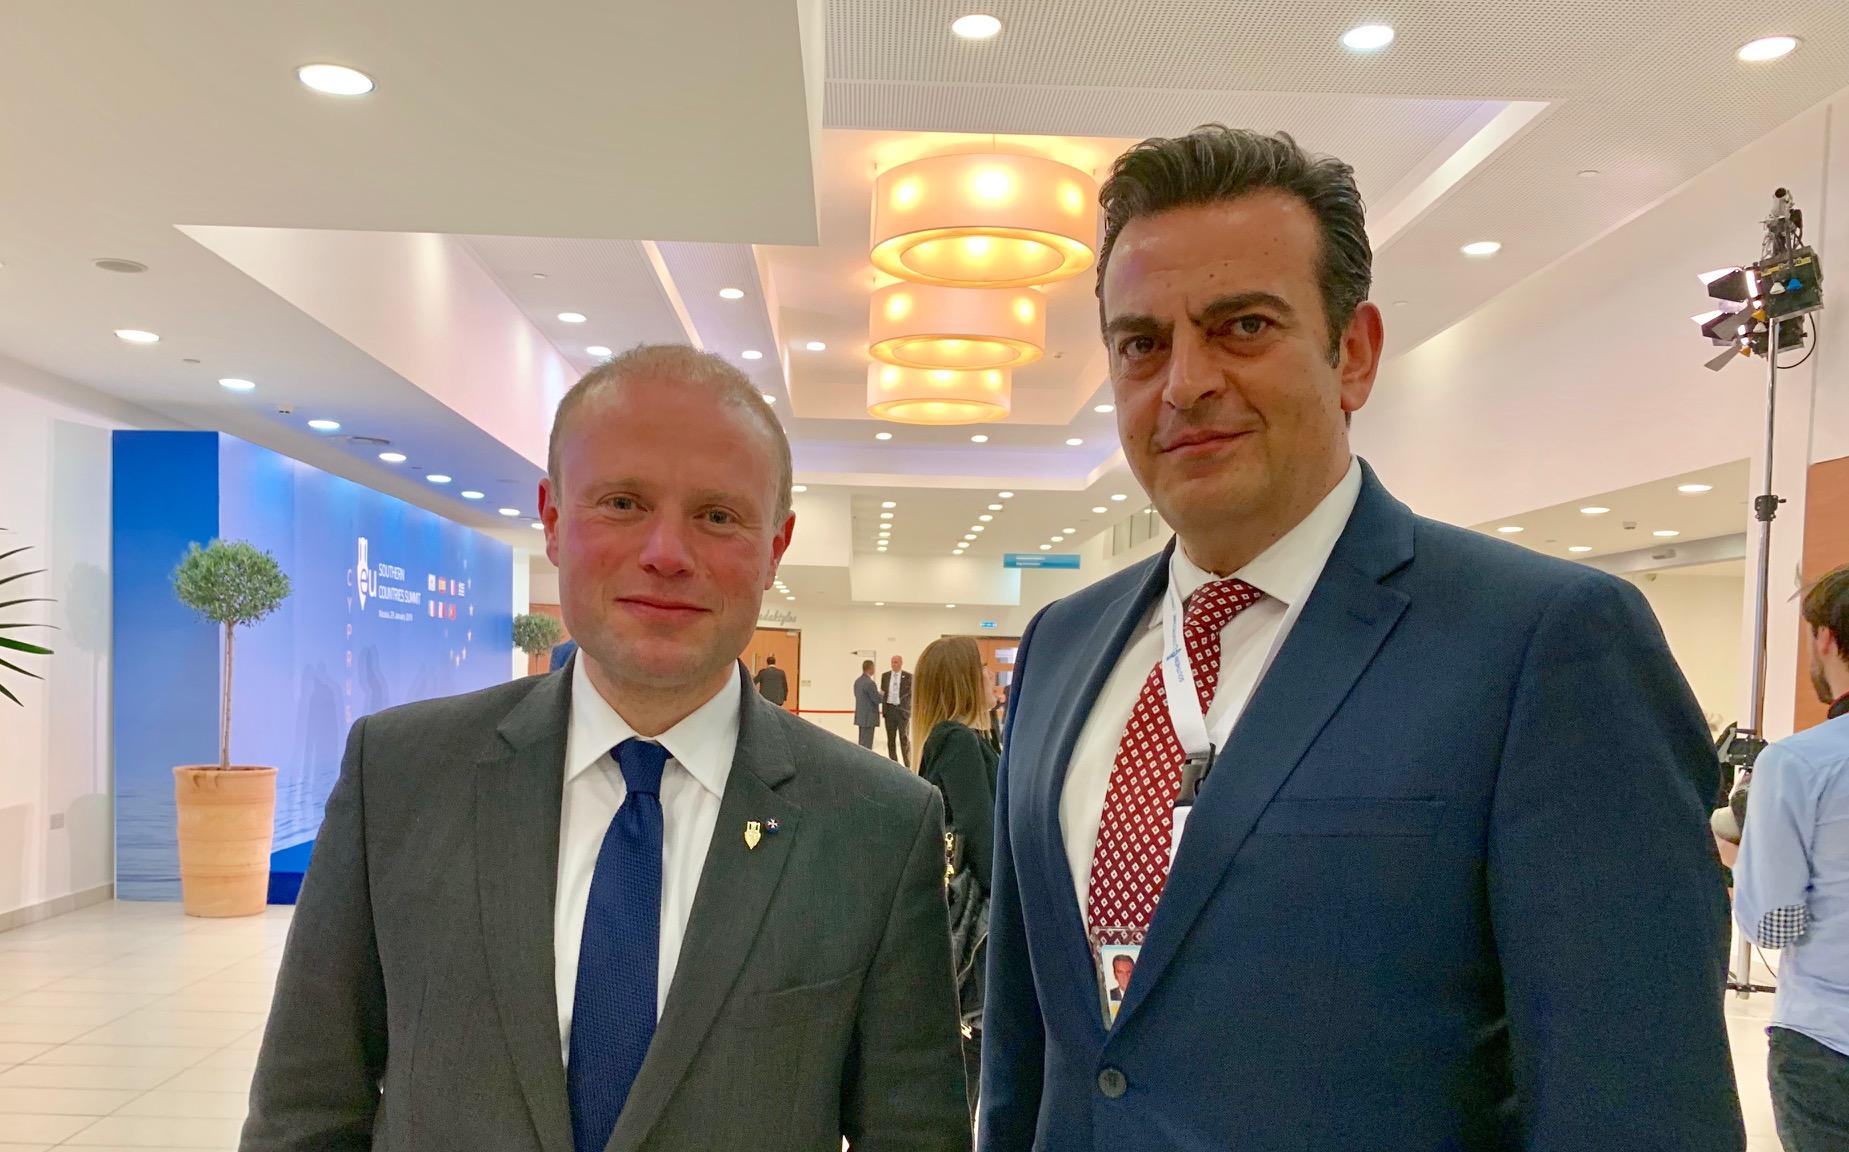 Muscat: Να ξεκαθαρίσουμε που θέλουμε να πάμε ως Μεσόγειος και ως Ευρώπη